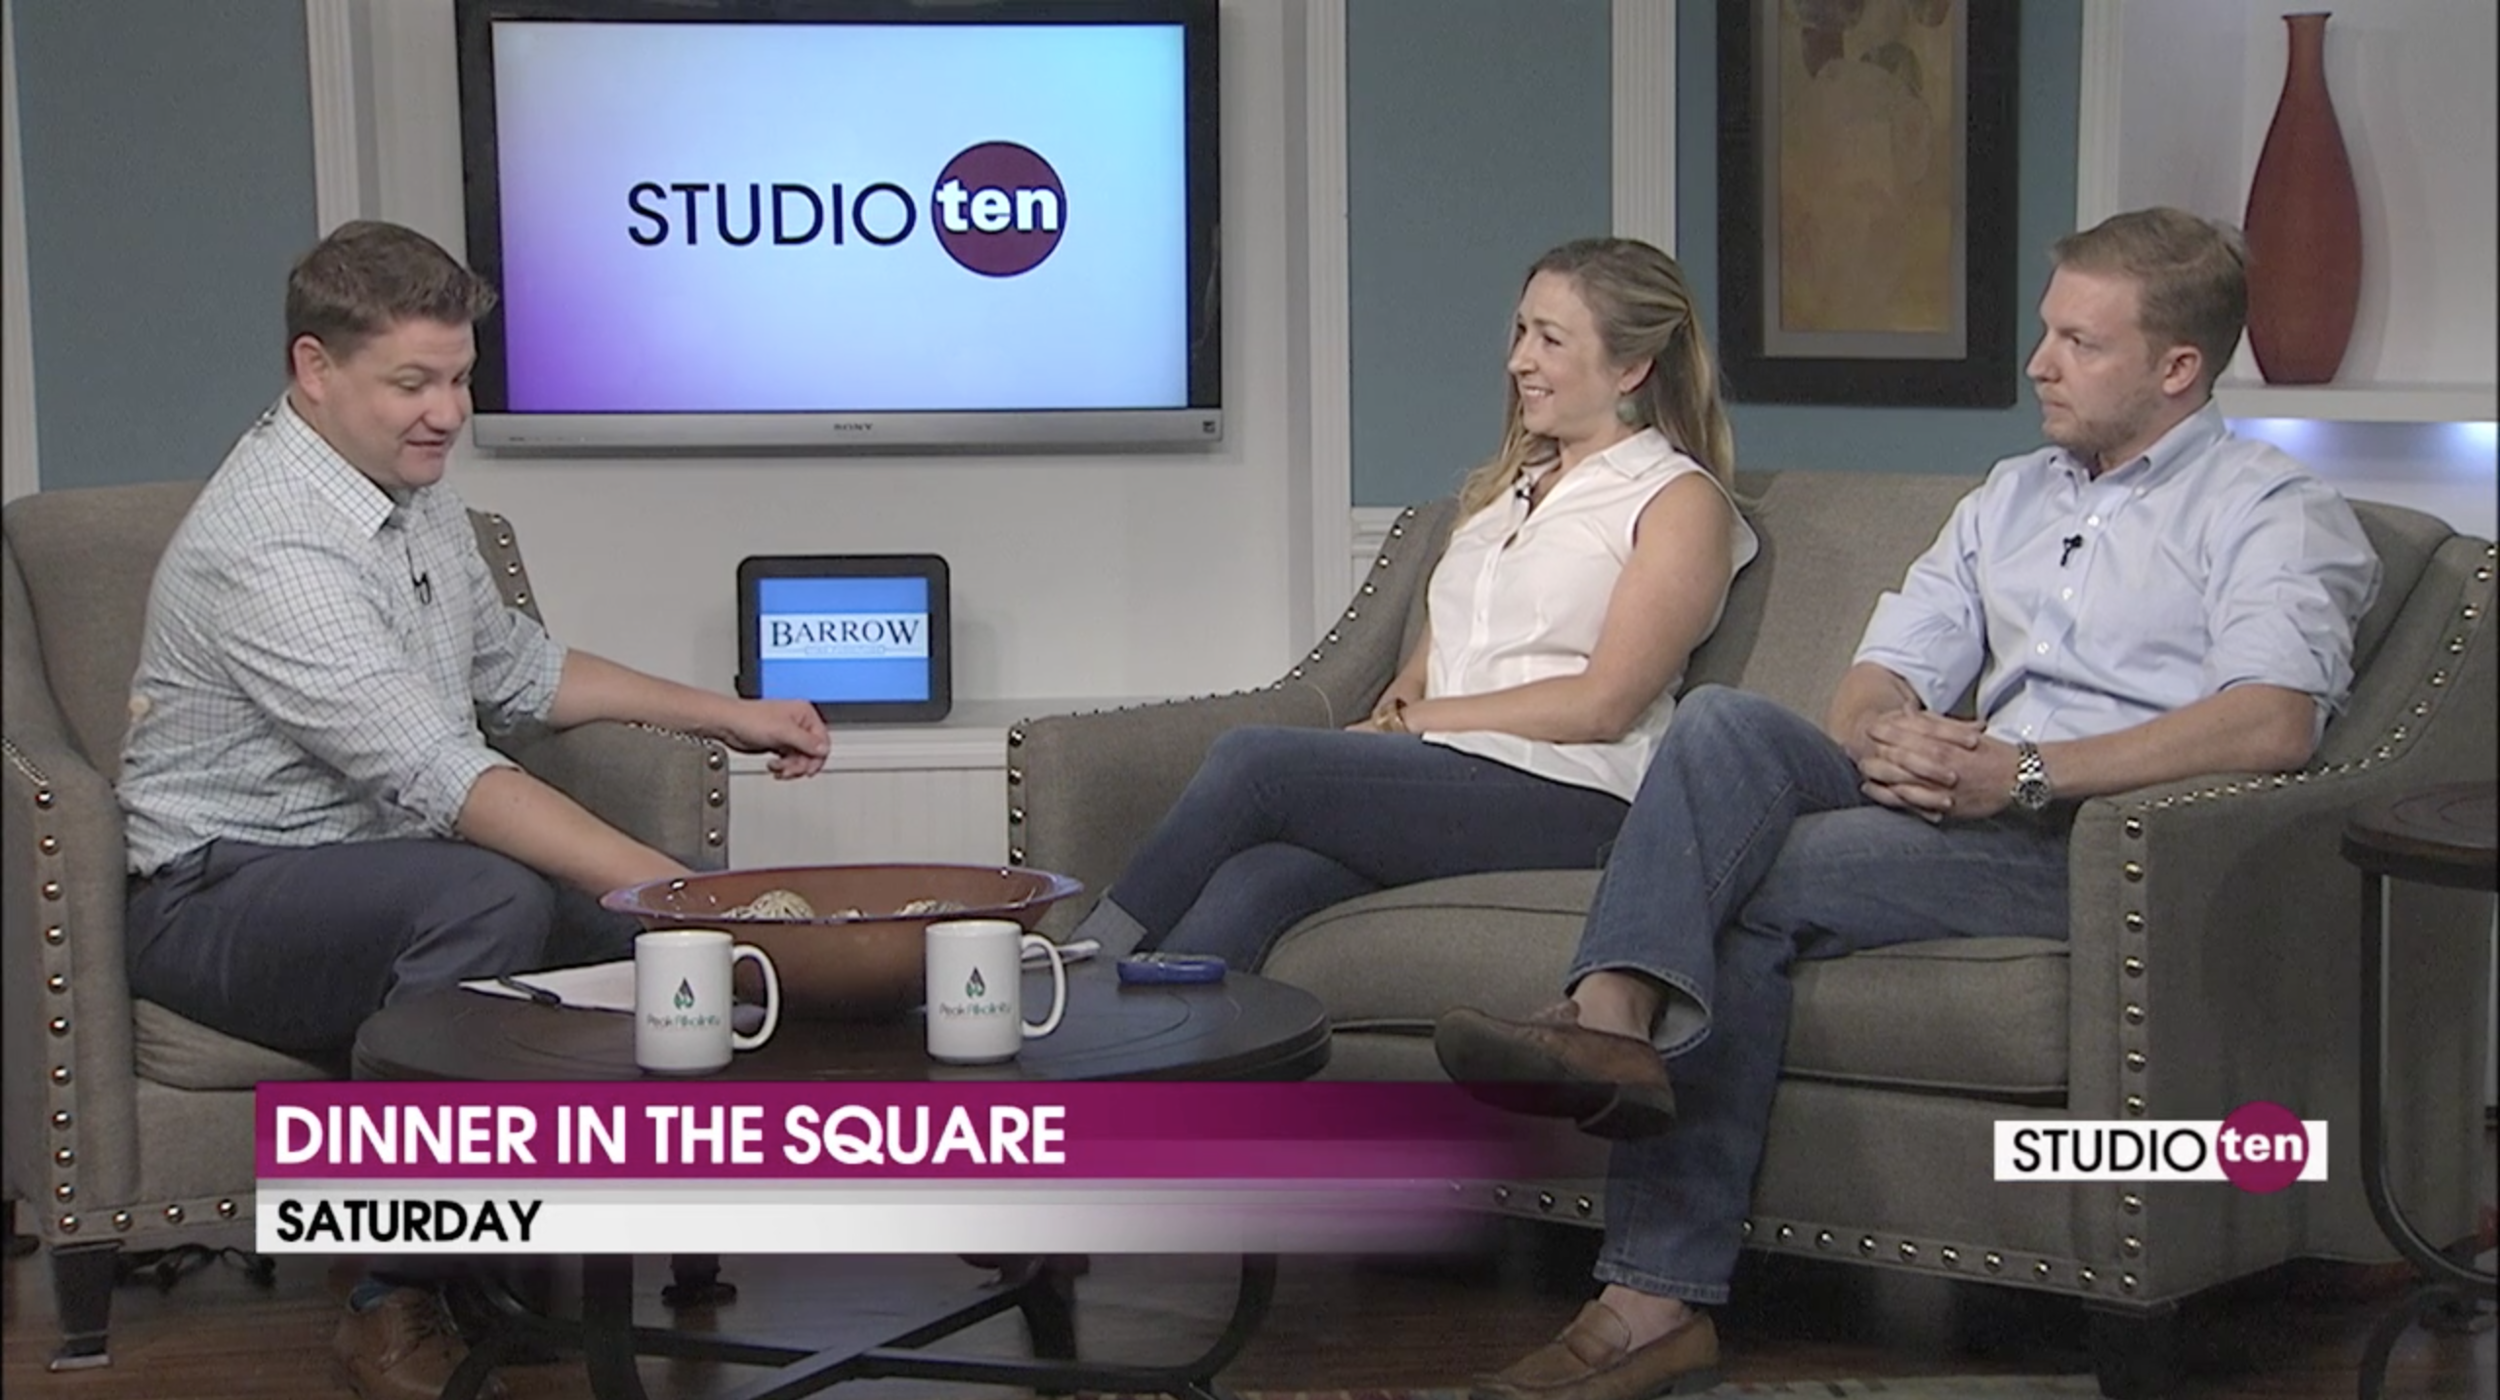 Oct. 04, 2018 - From Left: Joe Emer (Fox10 Host), Sarah Bohenstiel (President -DeTonti Square), Robert J Isakson II (President - Lafayette Land Company)